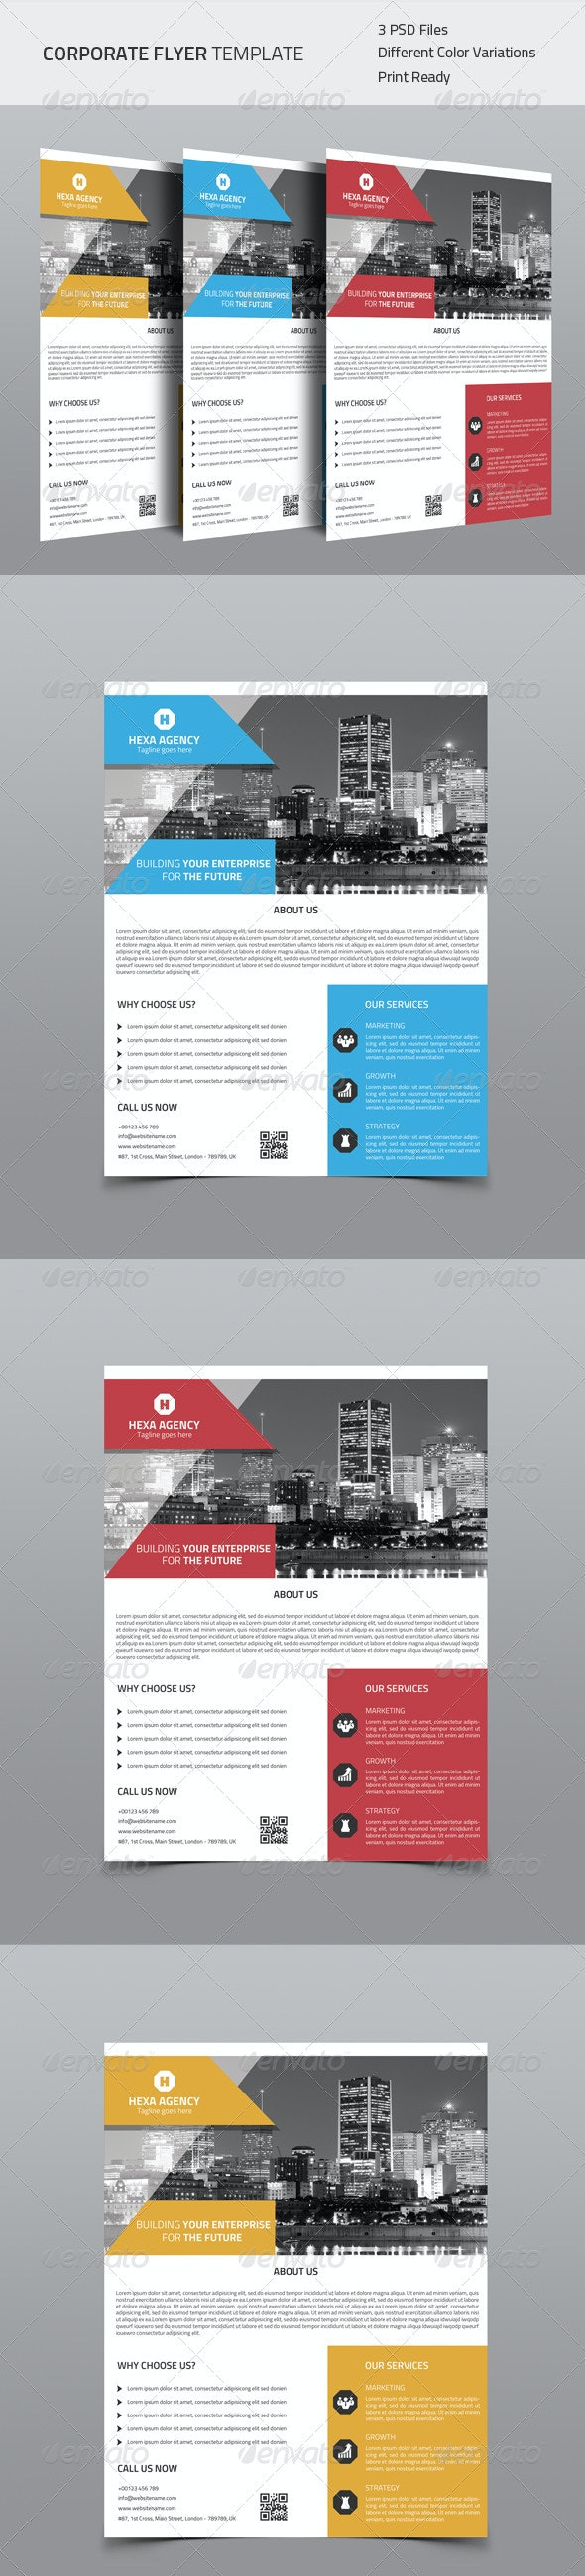 Corporate Flyer 04 - Corporate Flyers